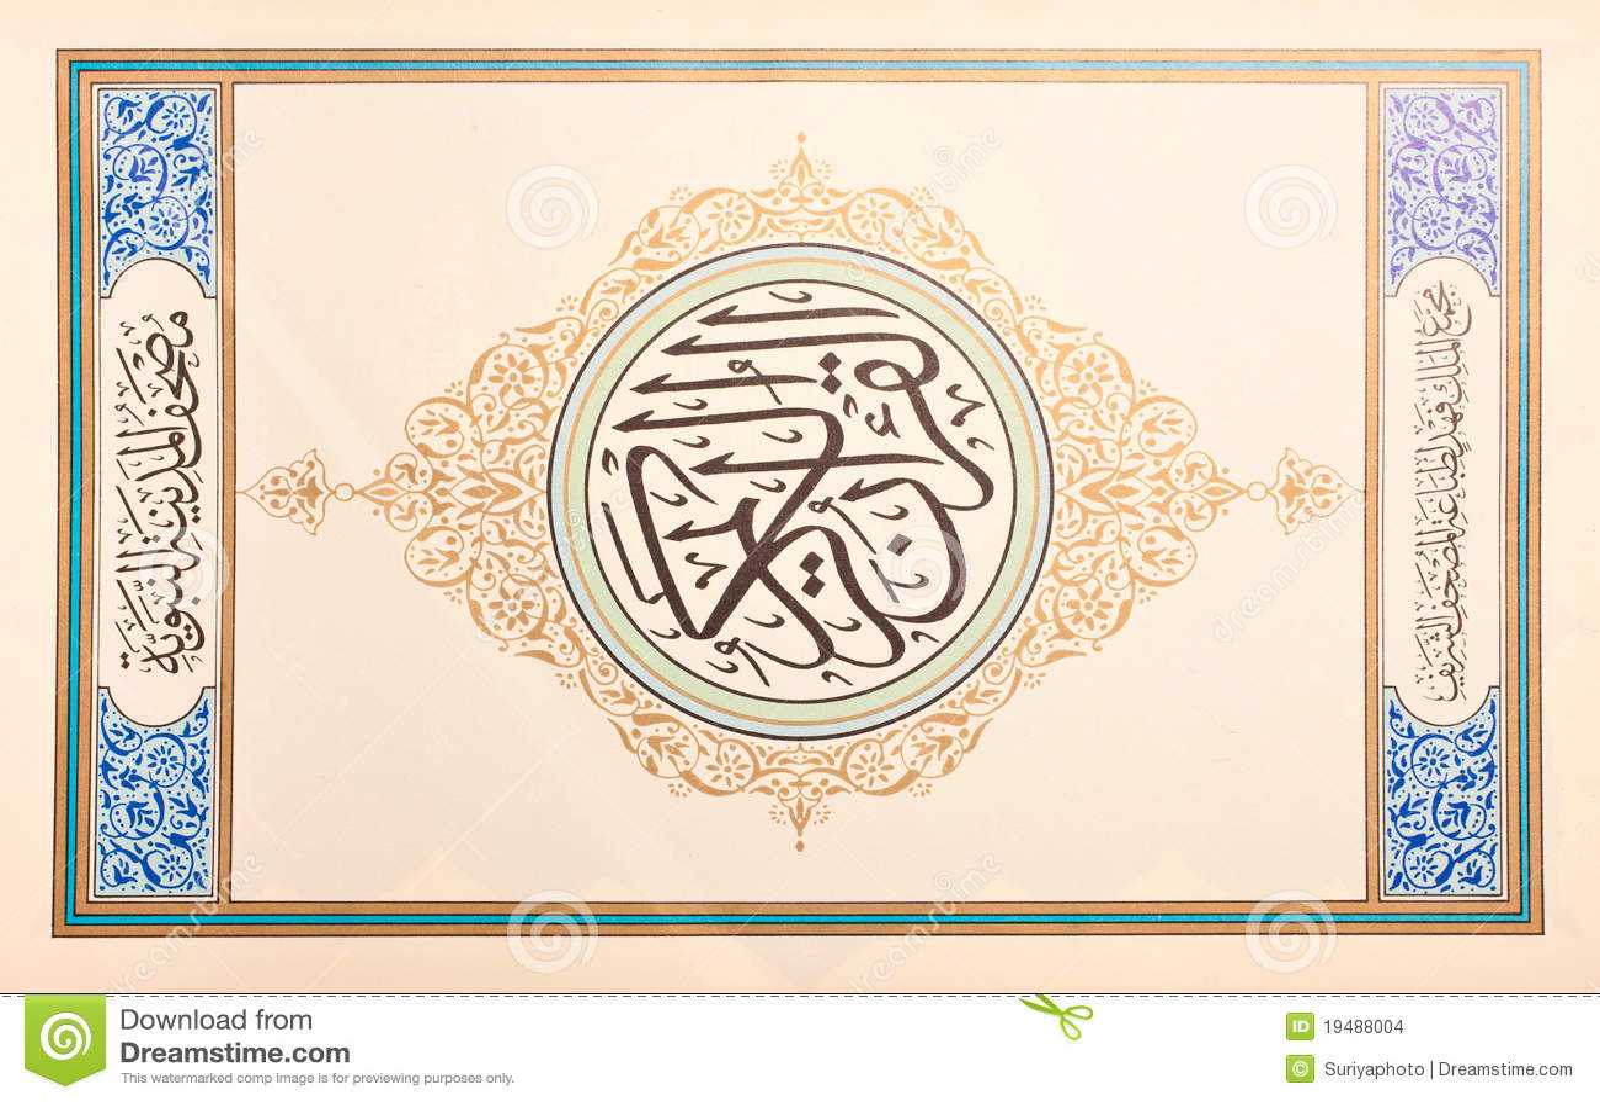 Koran, Heilige Schrift